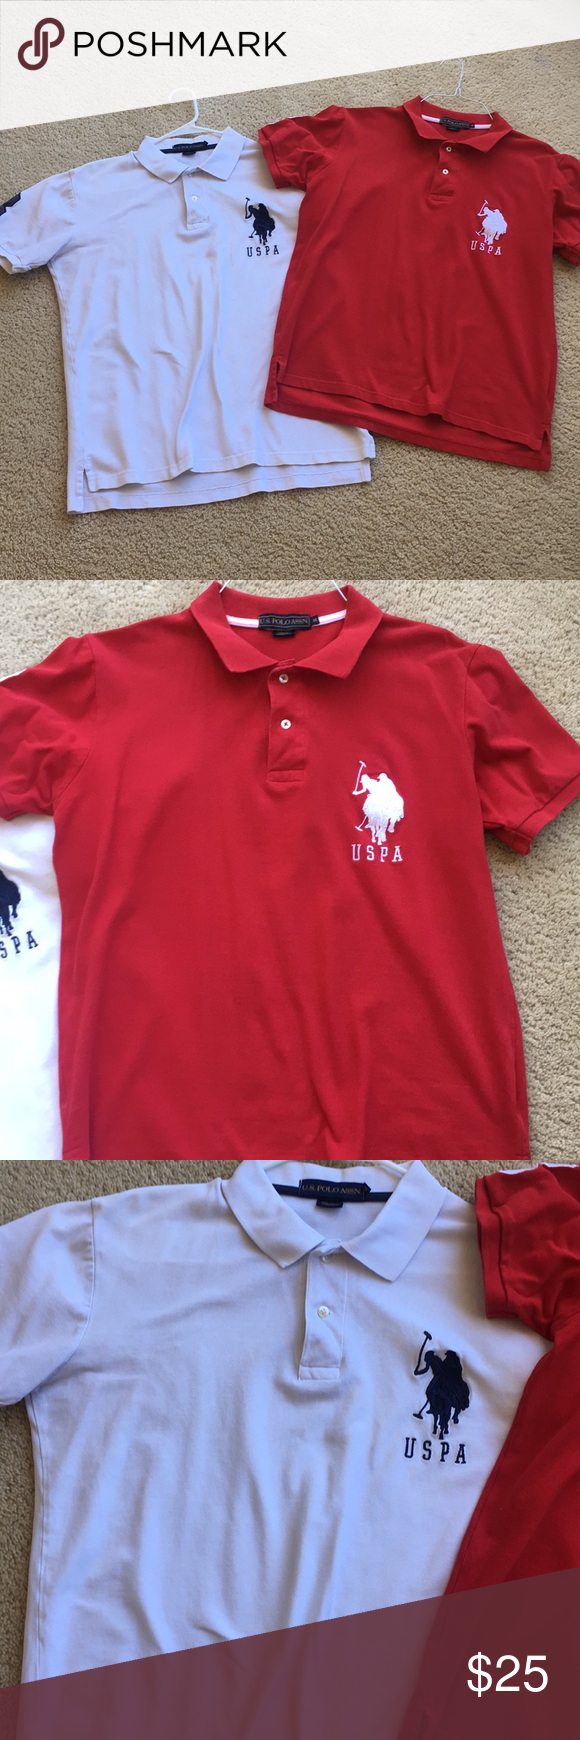 Men S Uspa Polo Shirts Shirts Polo Polo Shirt